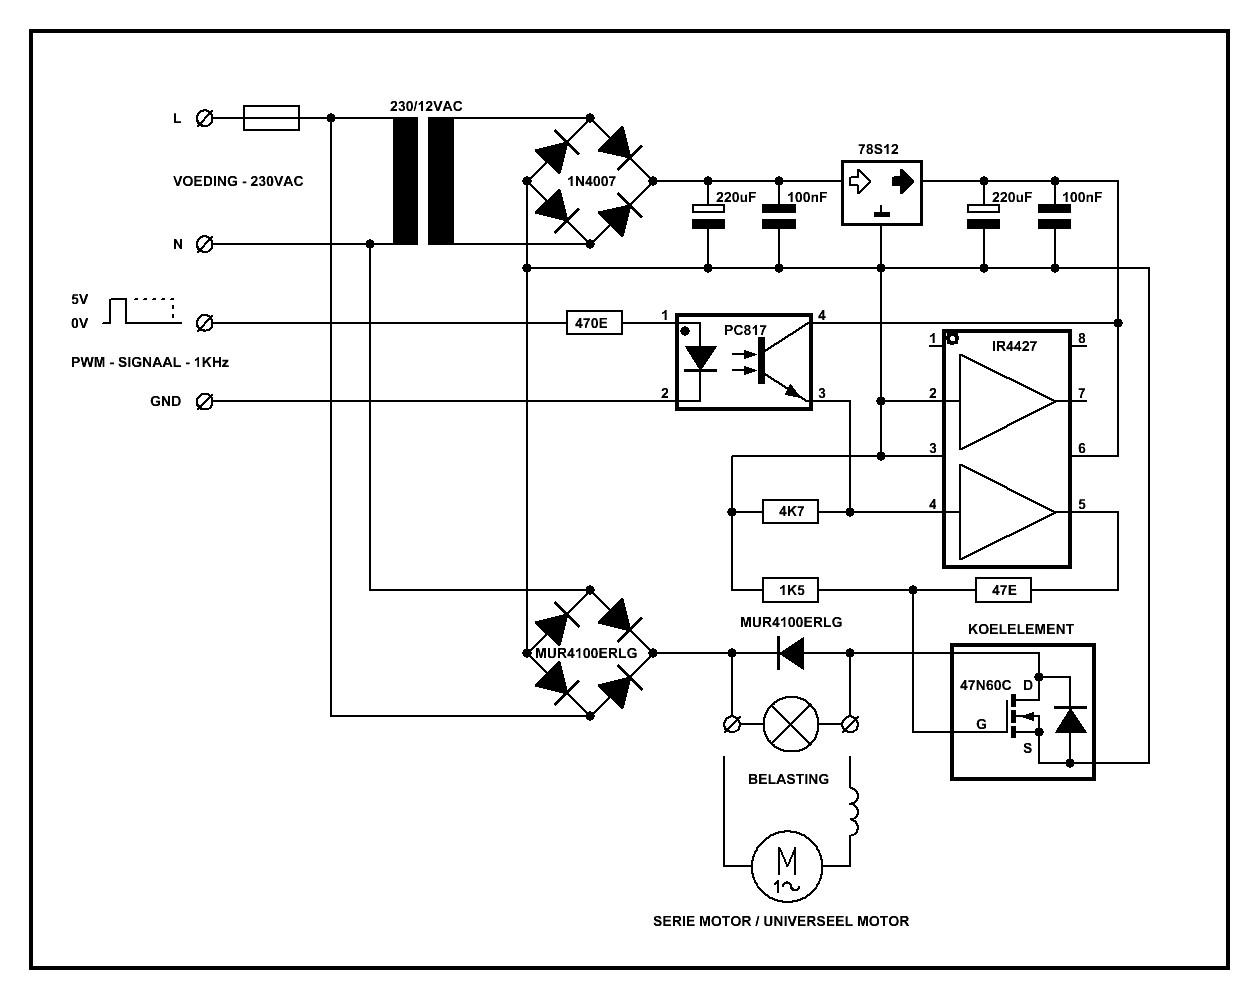 Zelf Dimmer Bouwen Forum Circuits Online Led Circuit Calculator Http Wwwcircuitsonlinenet Download 48 Uploadarchiefnet Files Resized